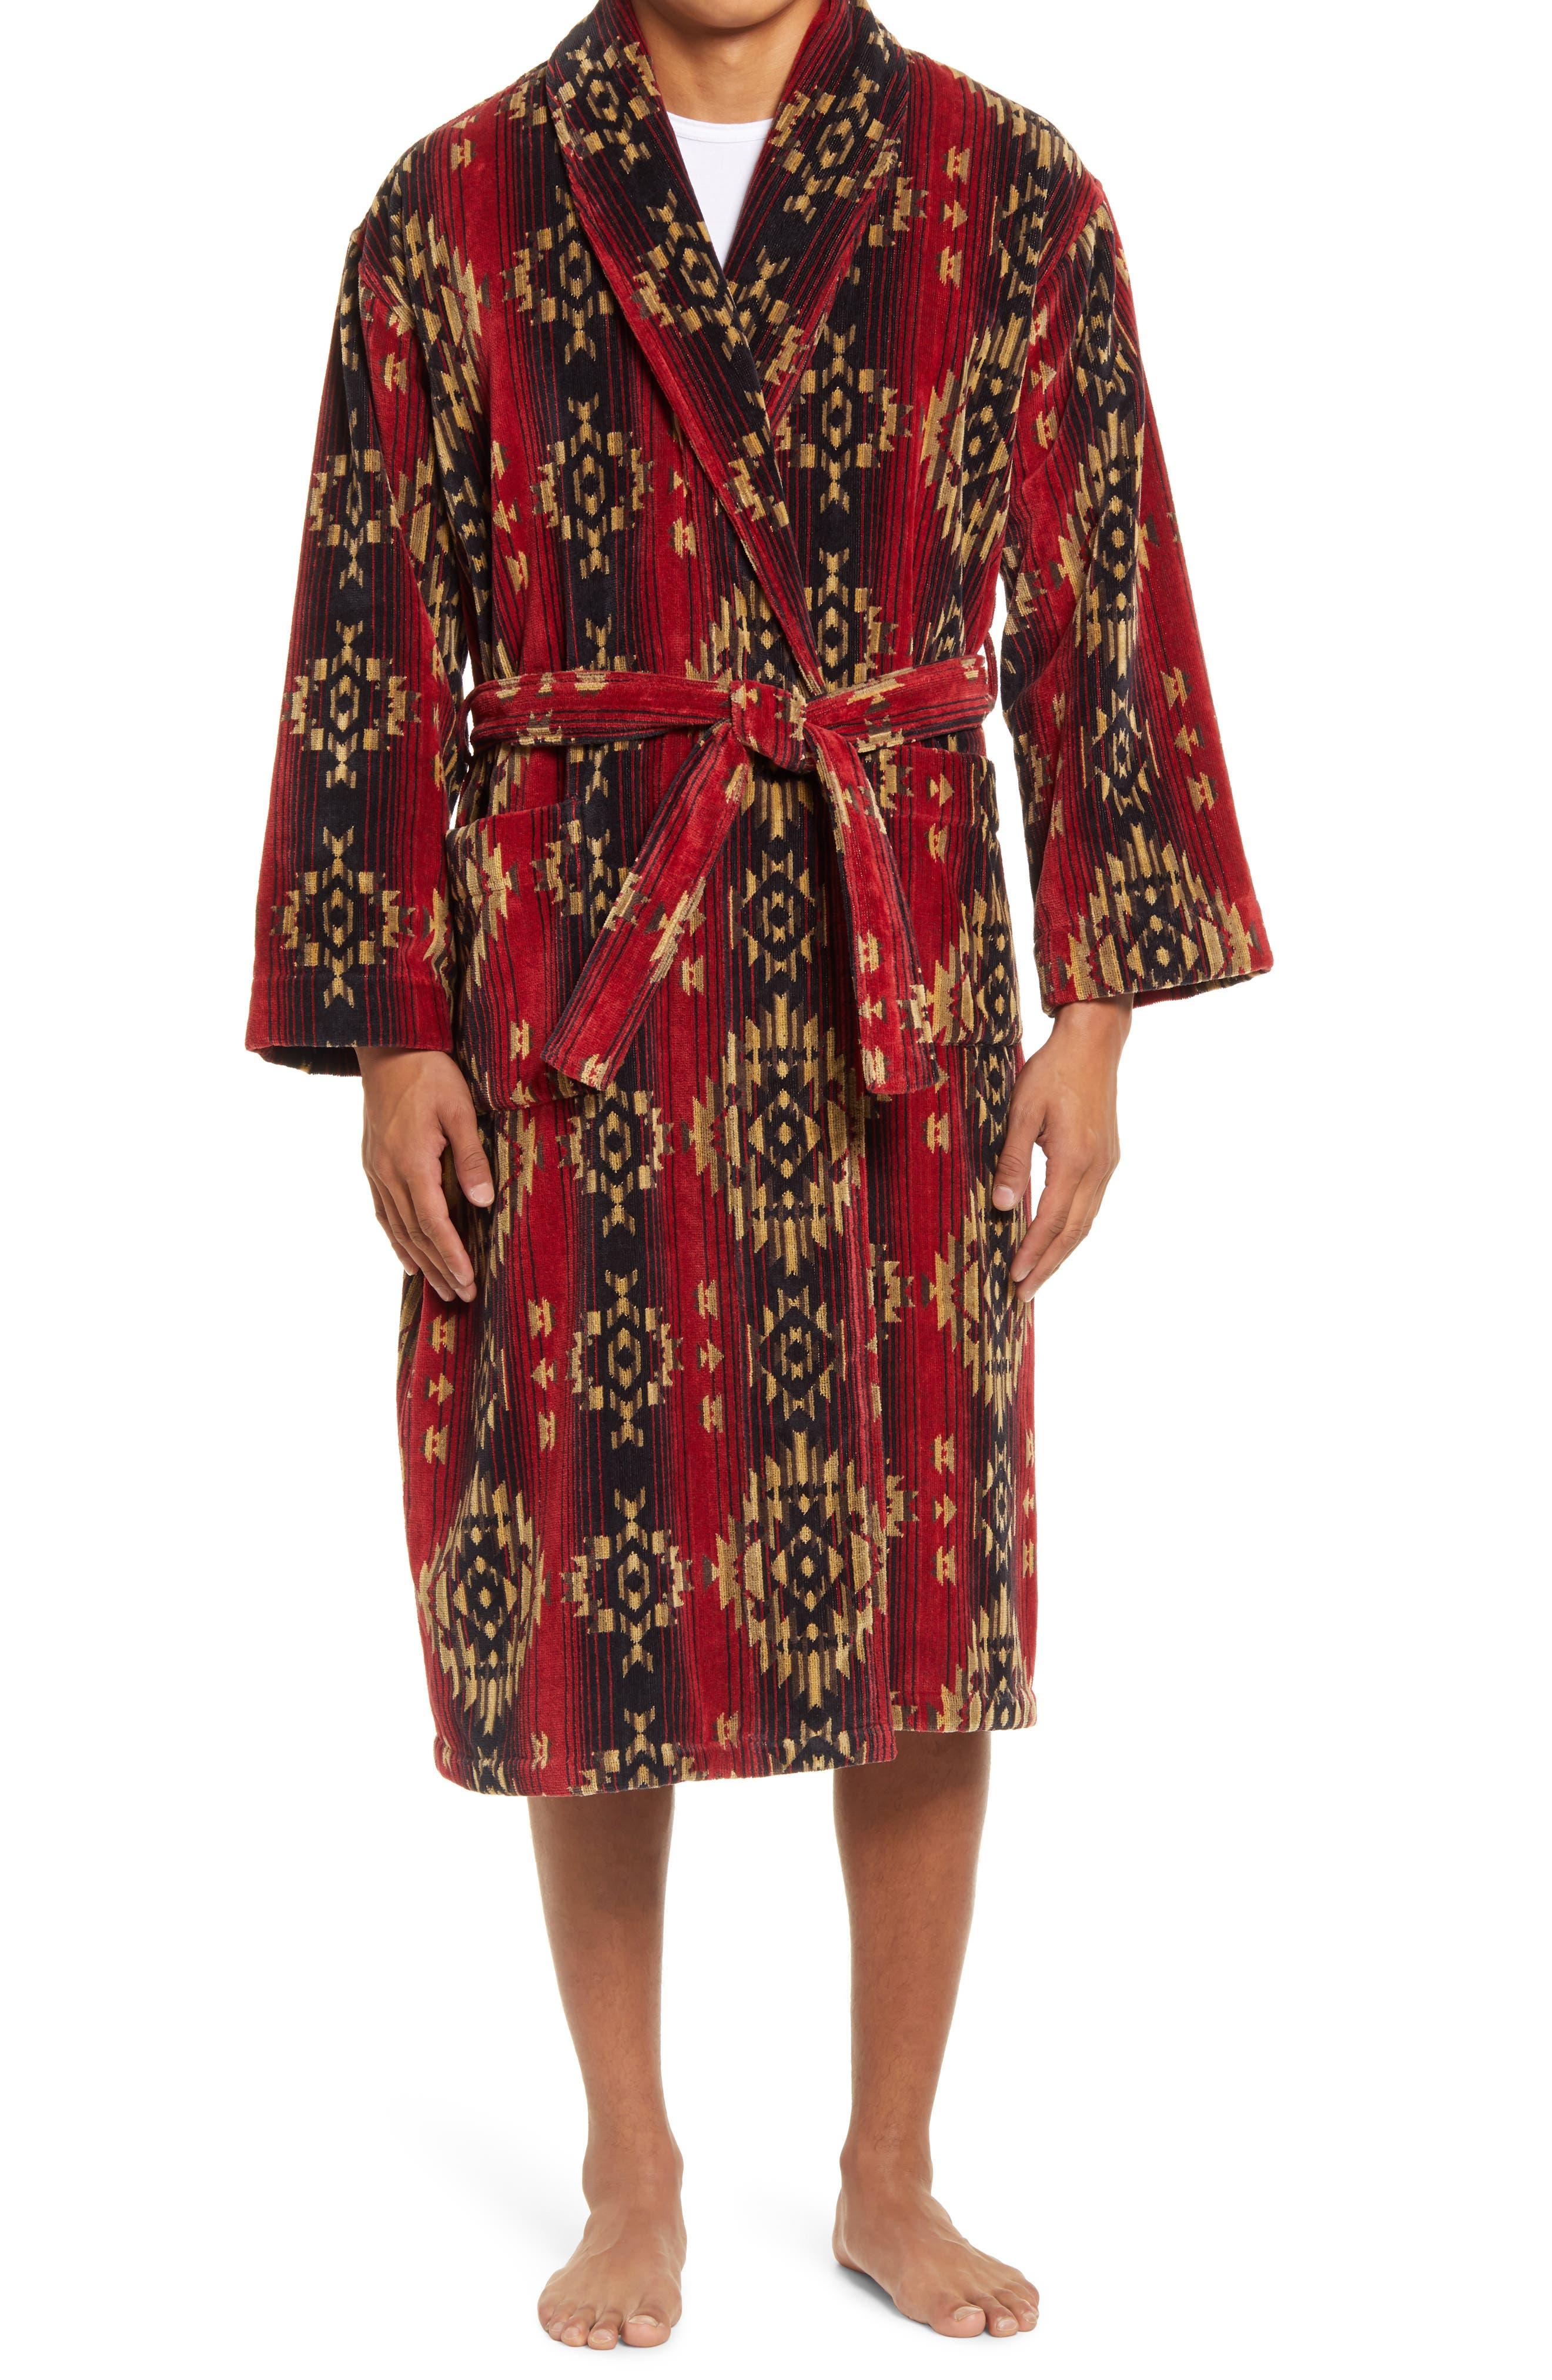 1940s Men's Underwear: Briefs, Boxers, Unions, & Socks Mens Majestic International Cotton Terry Velour Robe Size SmallMedium - Red $110.00 AT vintagedancer.com